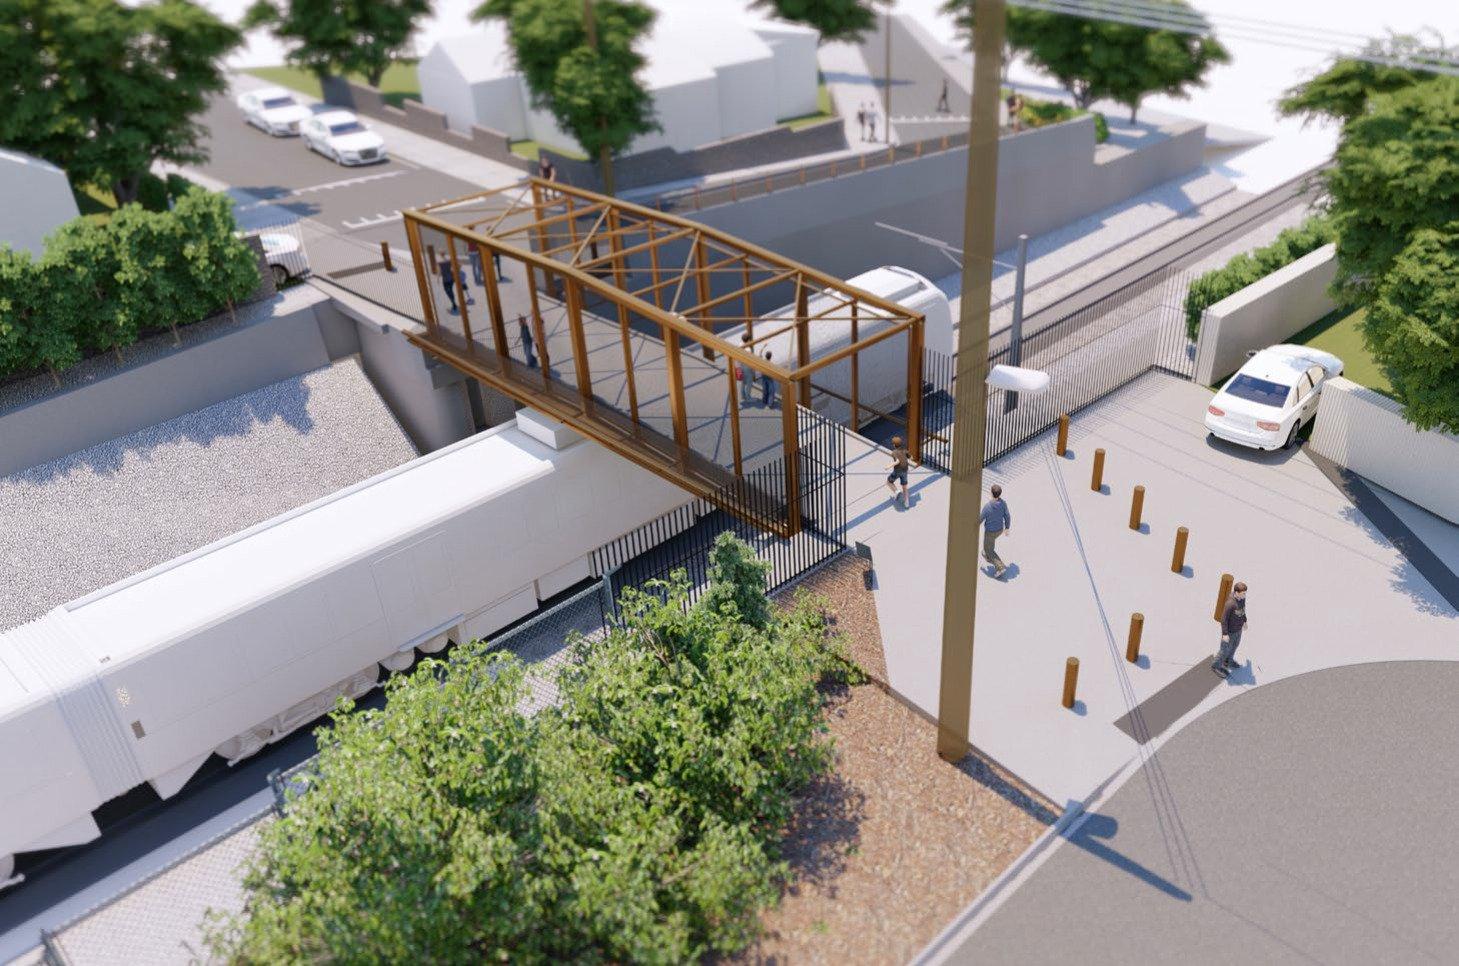 King Street Pedestrian Bridge - Concept Design